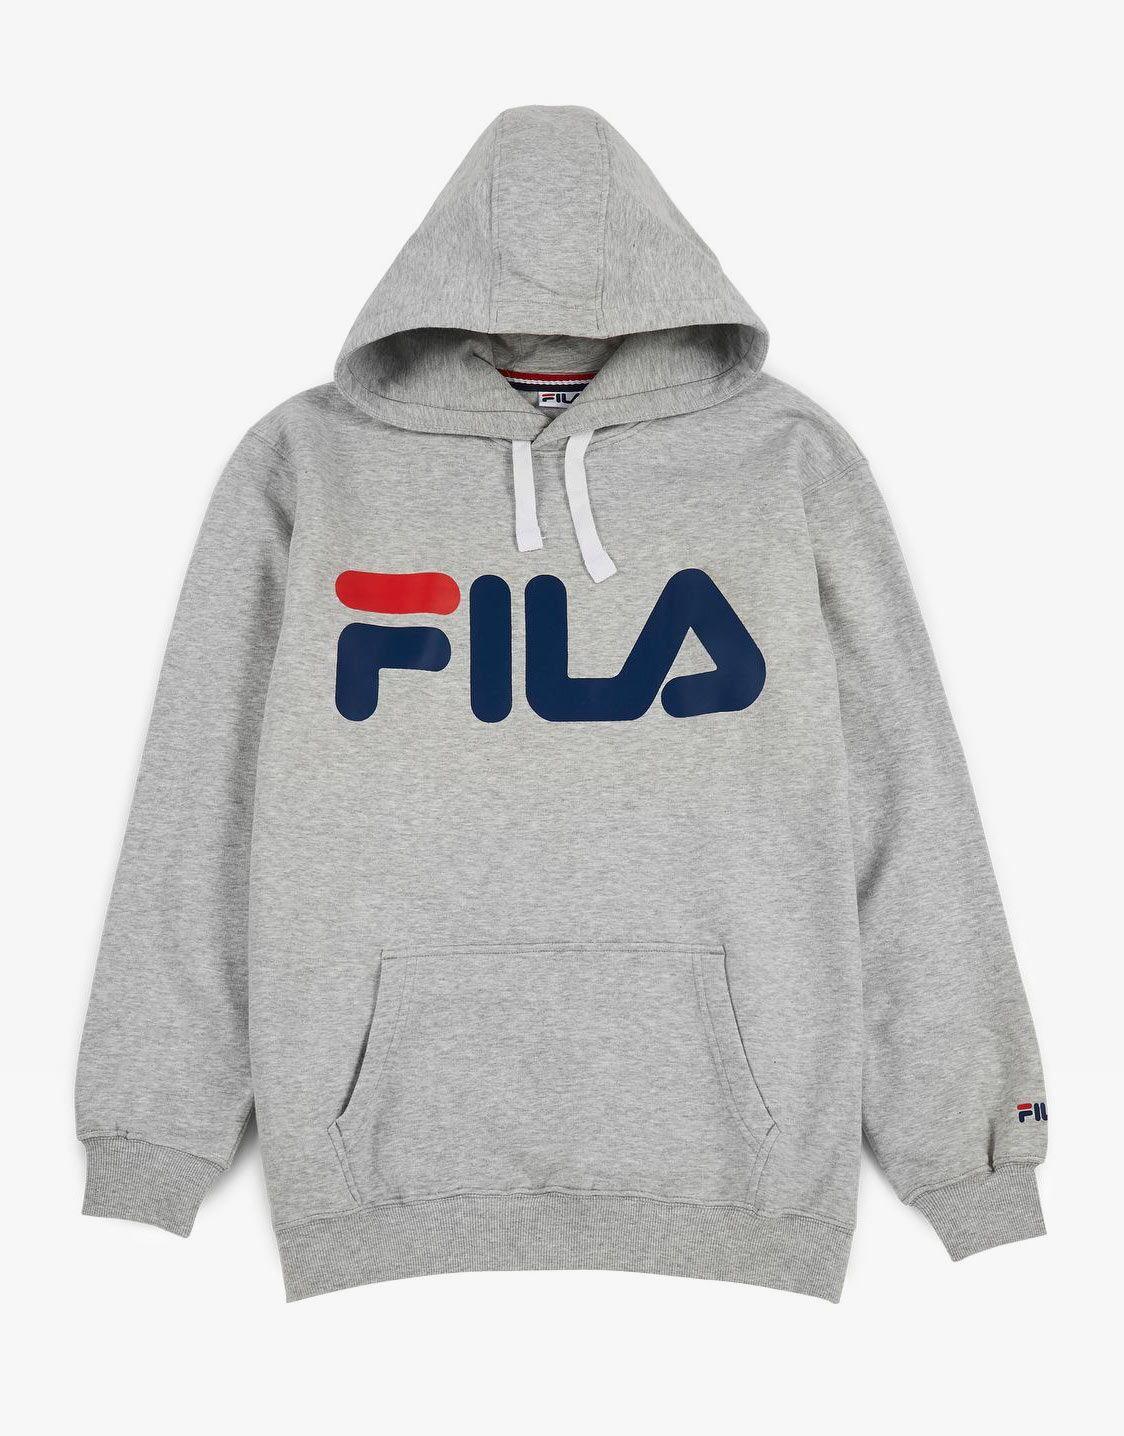 Details about Fila Men's Logo Fleece Pullover Hoodie Size XL Grey Black White